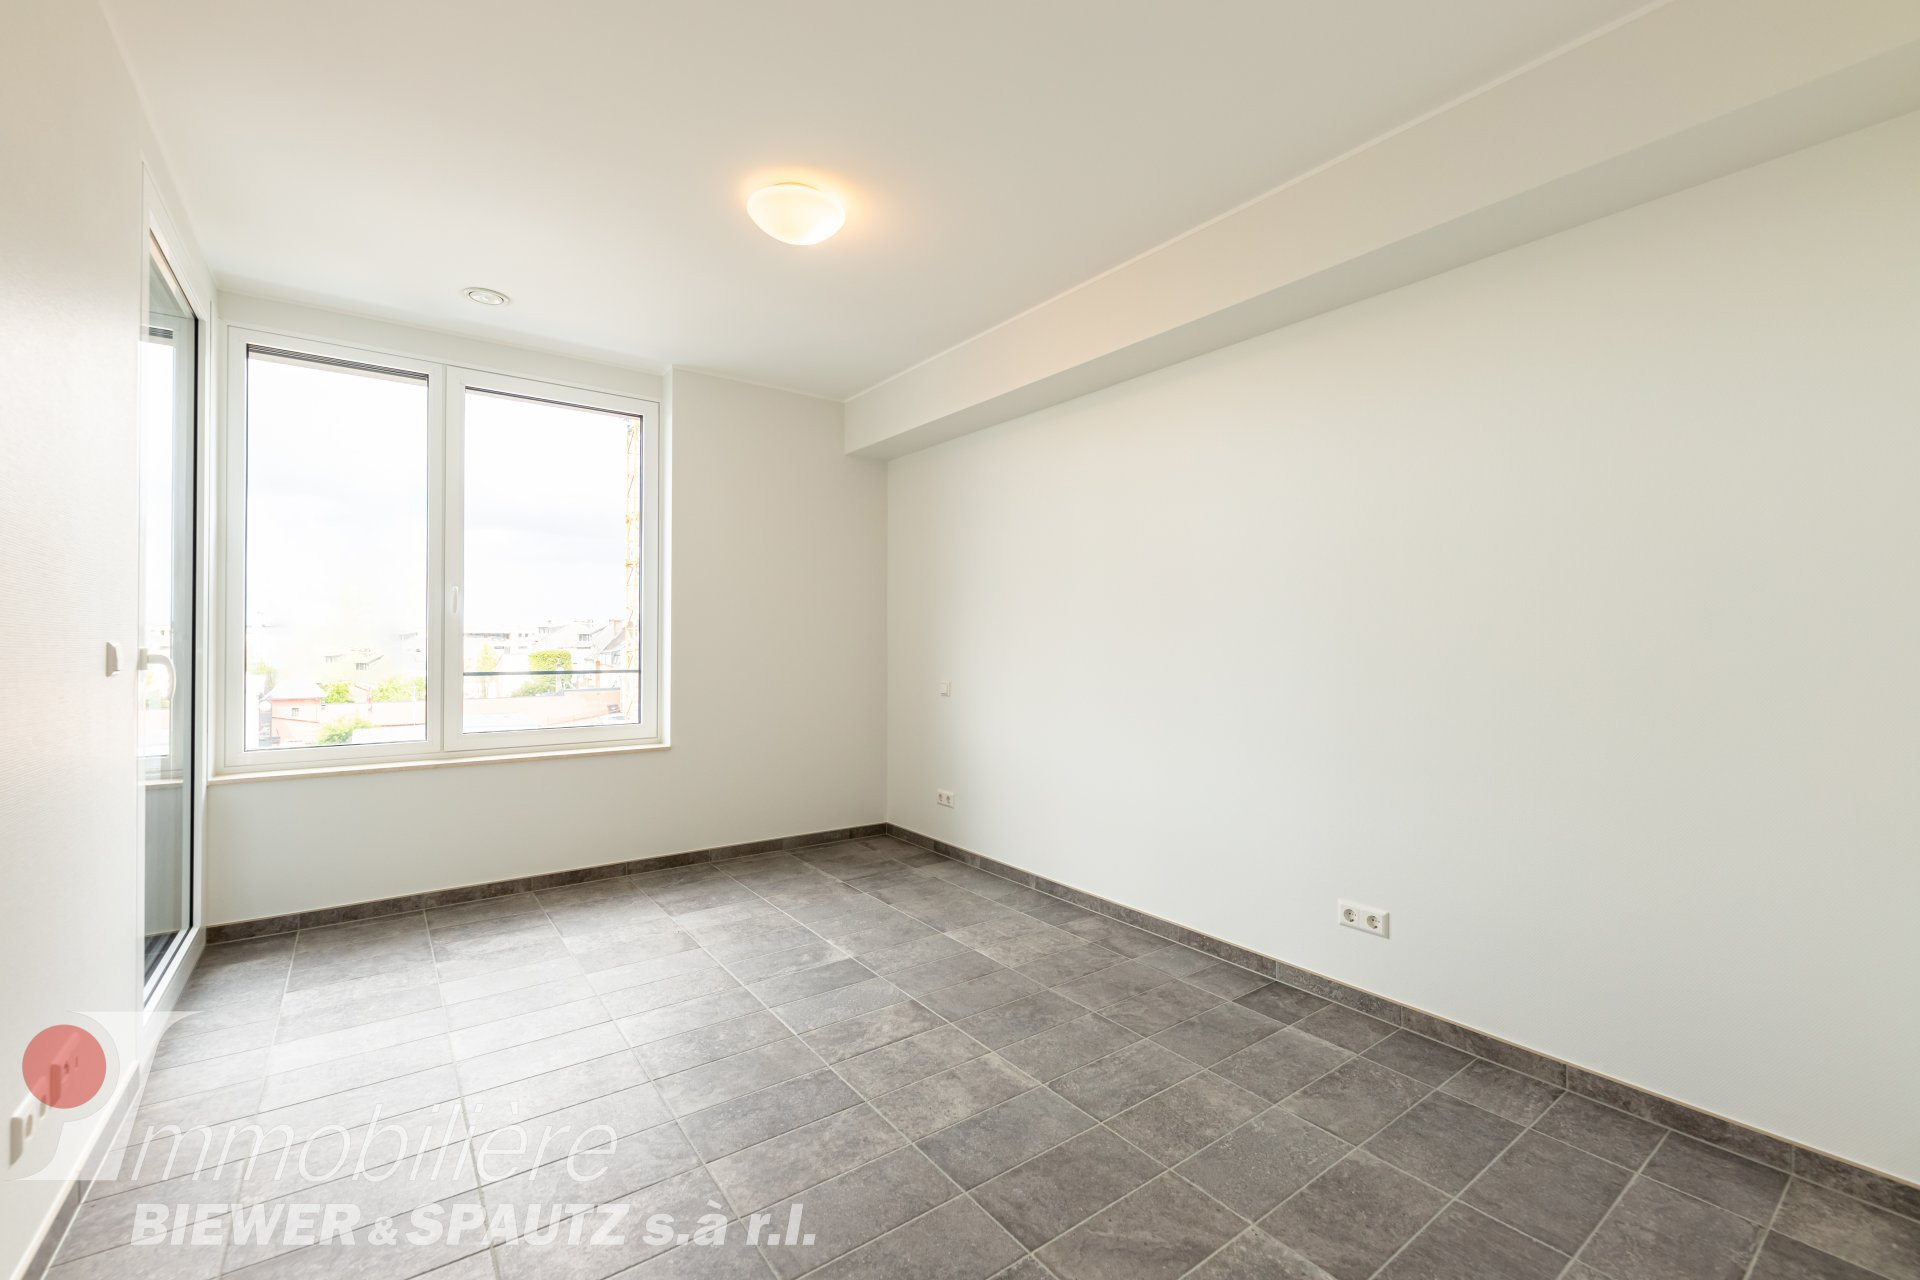 A LOUER - appartement neuf avec 1 chambre à coucher à Luxembourg-Gasperich